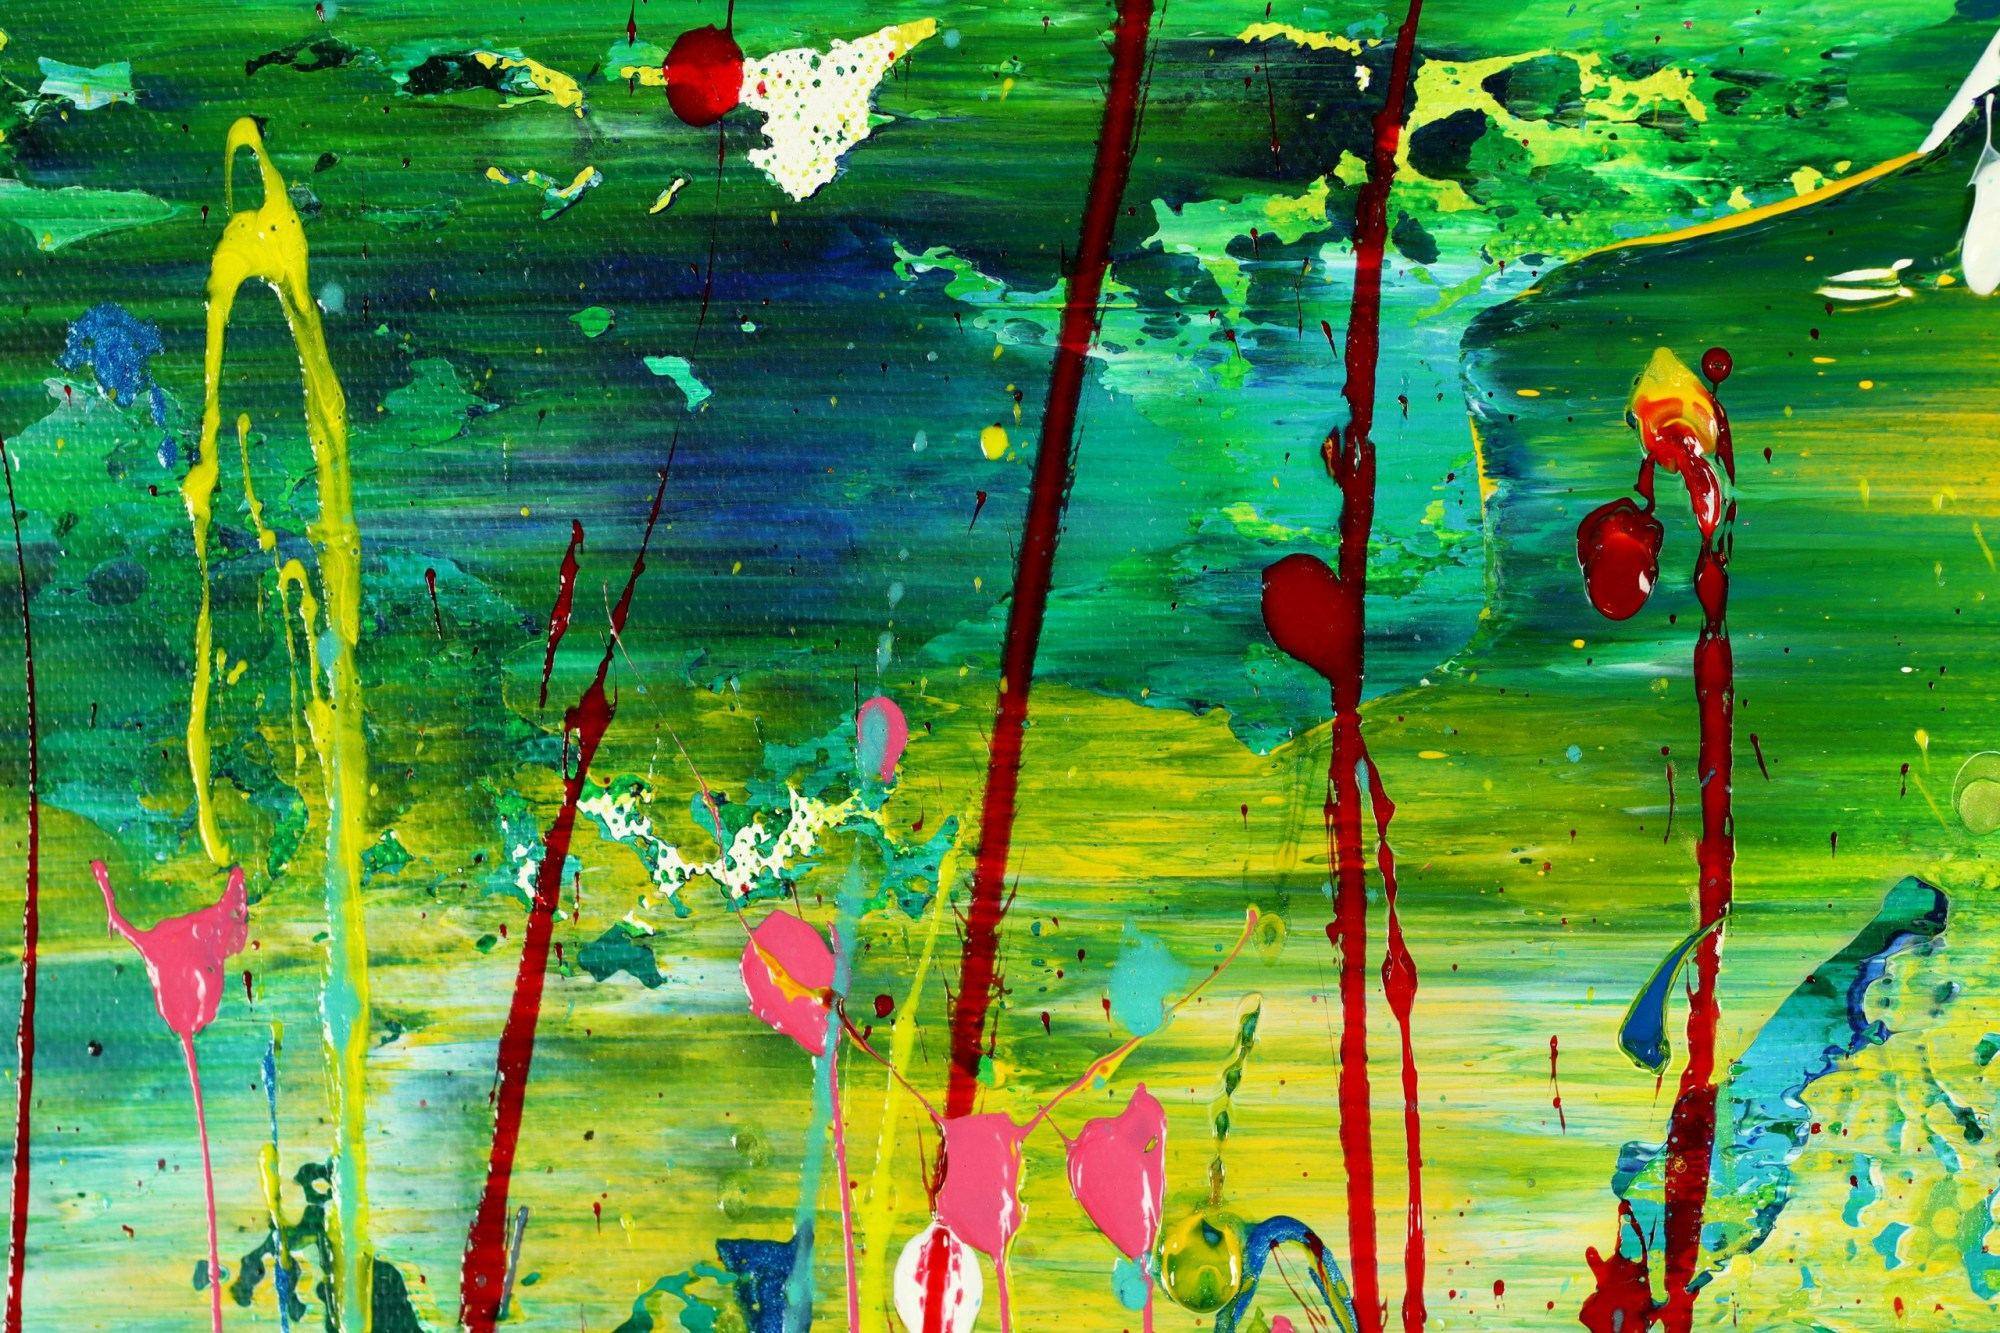 DETAIL / Caribbean Reflections 2 (2021) / 24 x 30 inches / Nestor Toro